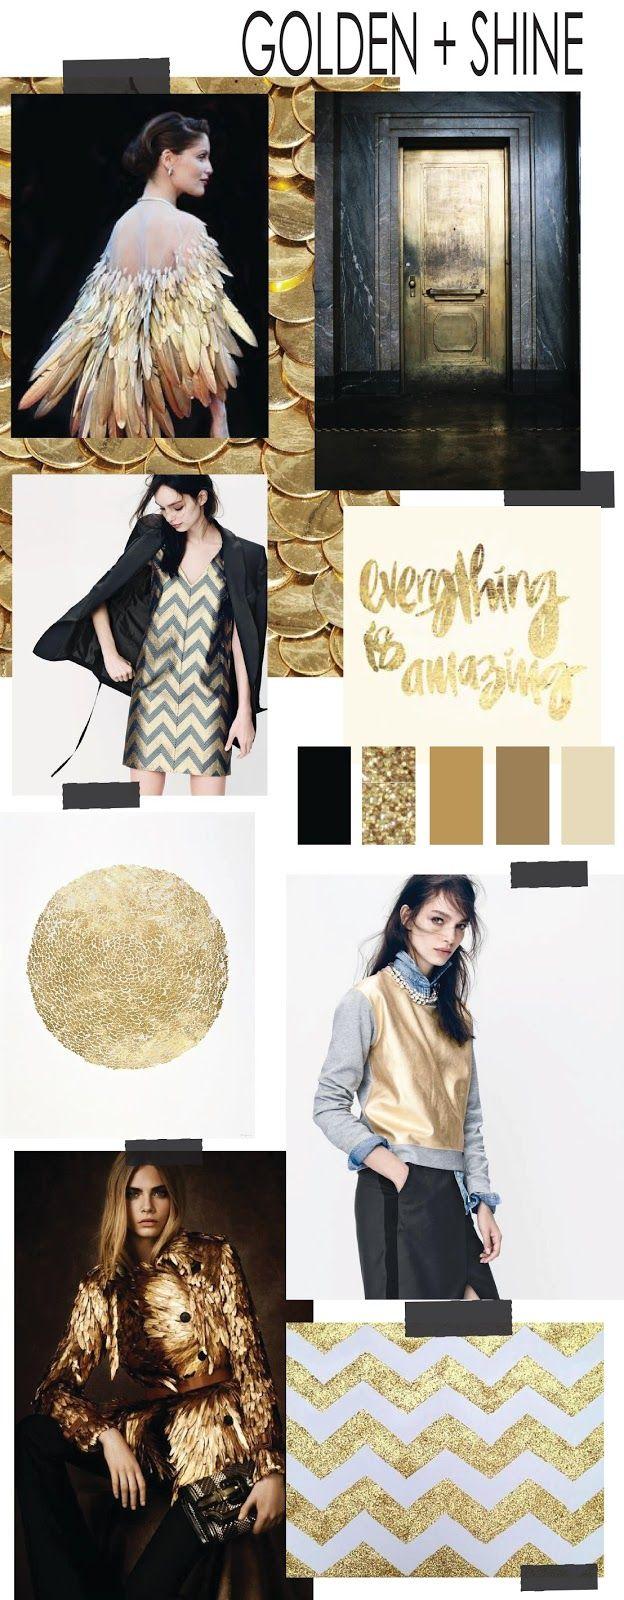 Sources of inspirations - Pinterest links hereLaetitia Casta en Christian Dior | J Crew | Kelley...